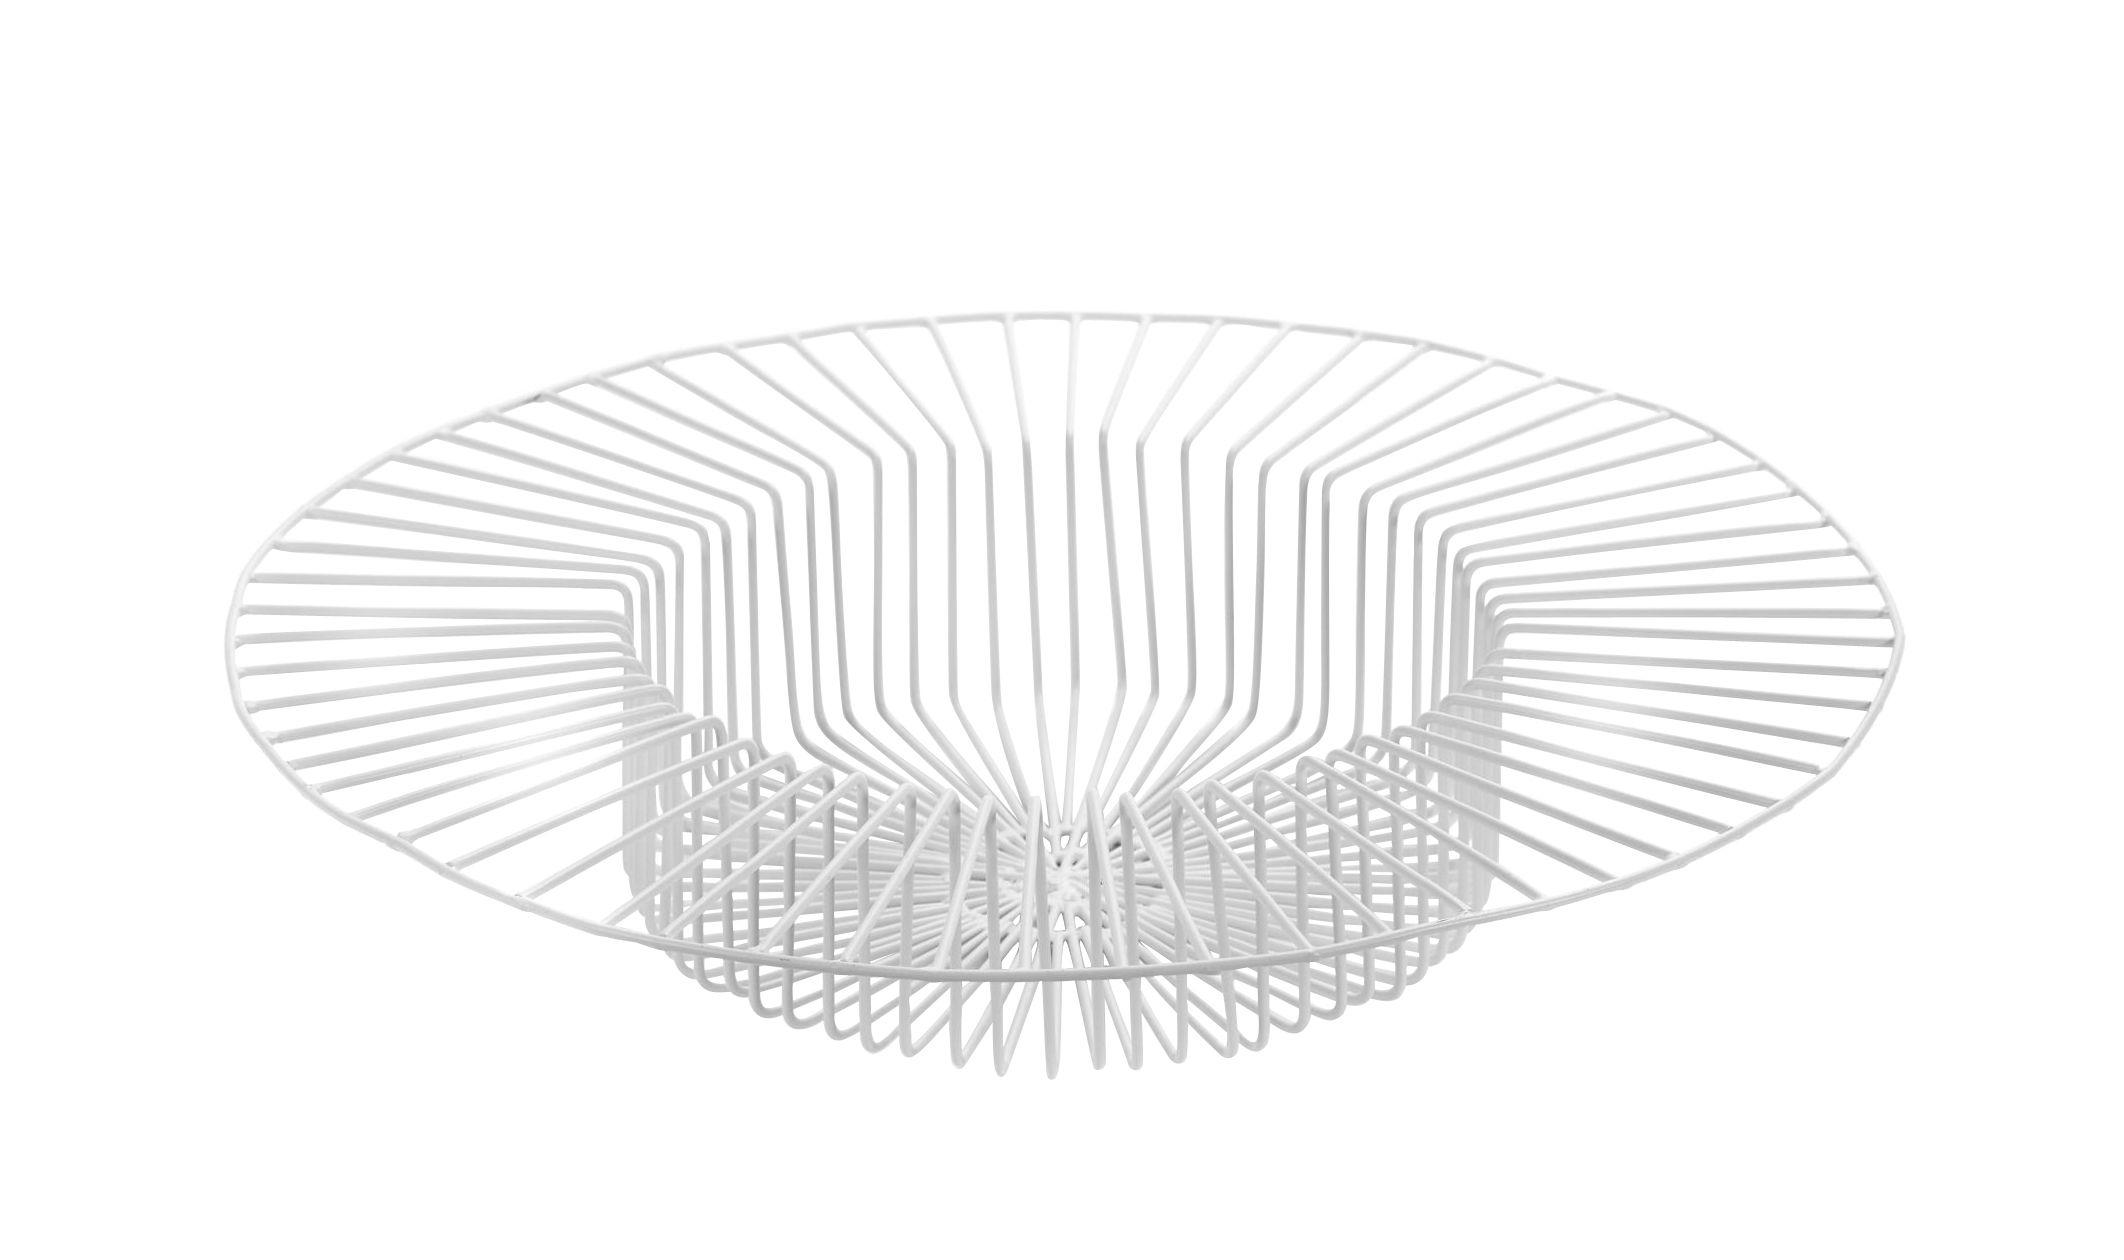 Déco - Corbeilles, centres de table, vide-poches - Corbeille Paglieta / Ø 45 x H 8 cm - Serax - Blanc - Fil de fer laqué